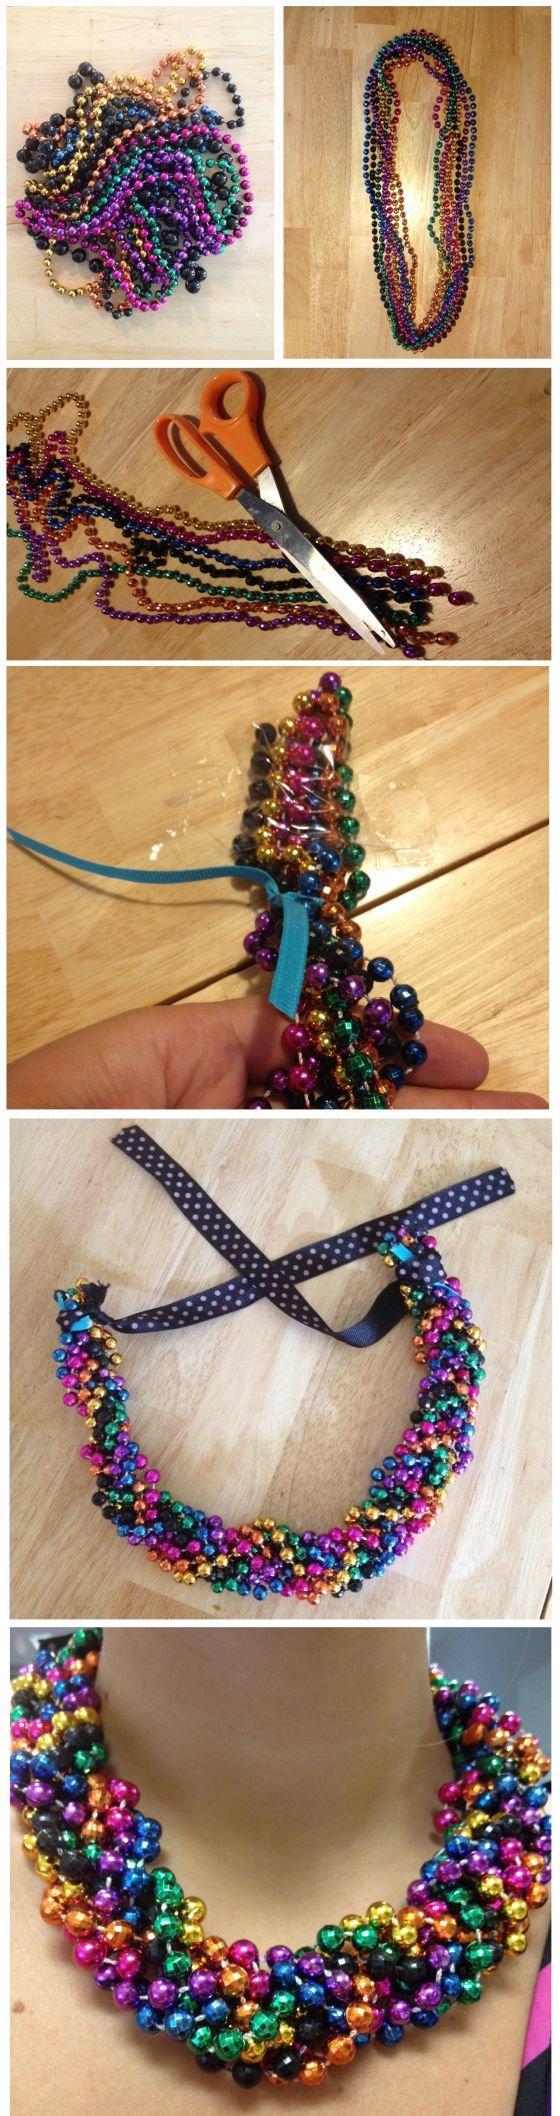 Braided Mardi Gras Bead Statement Necklace